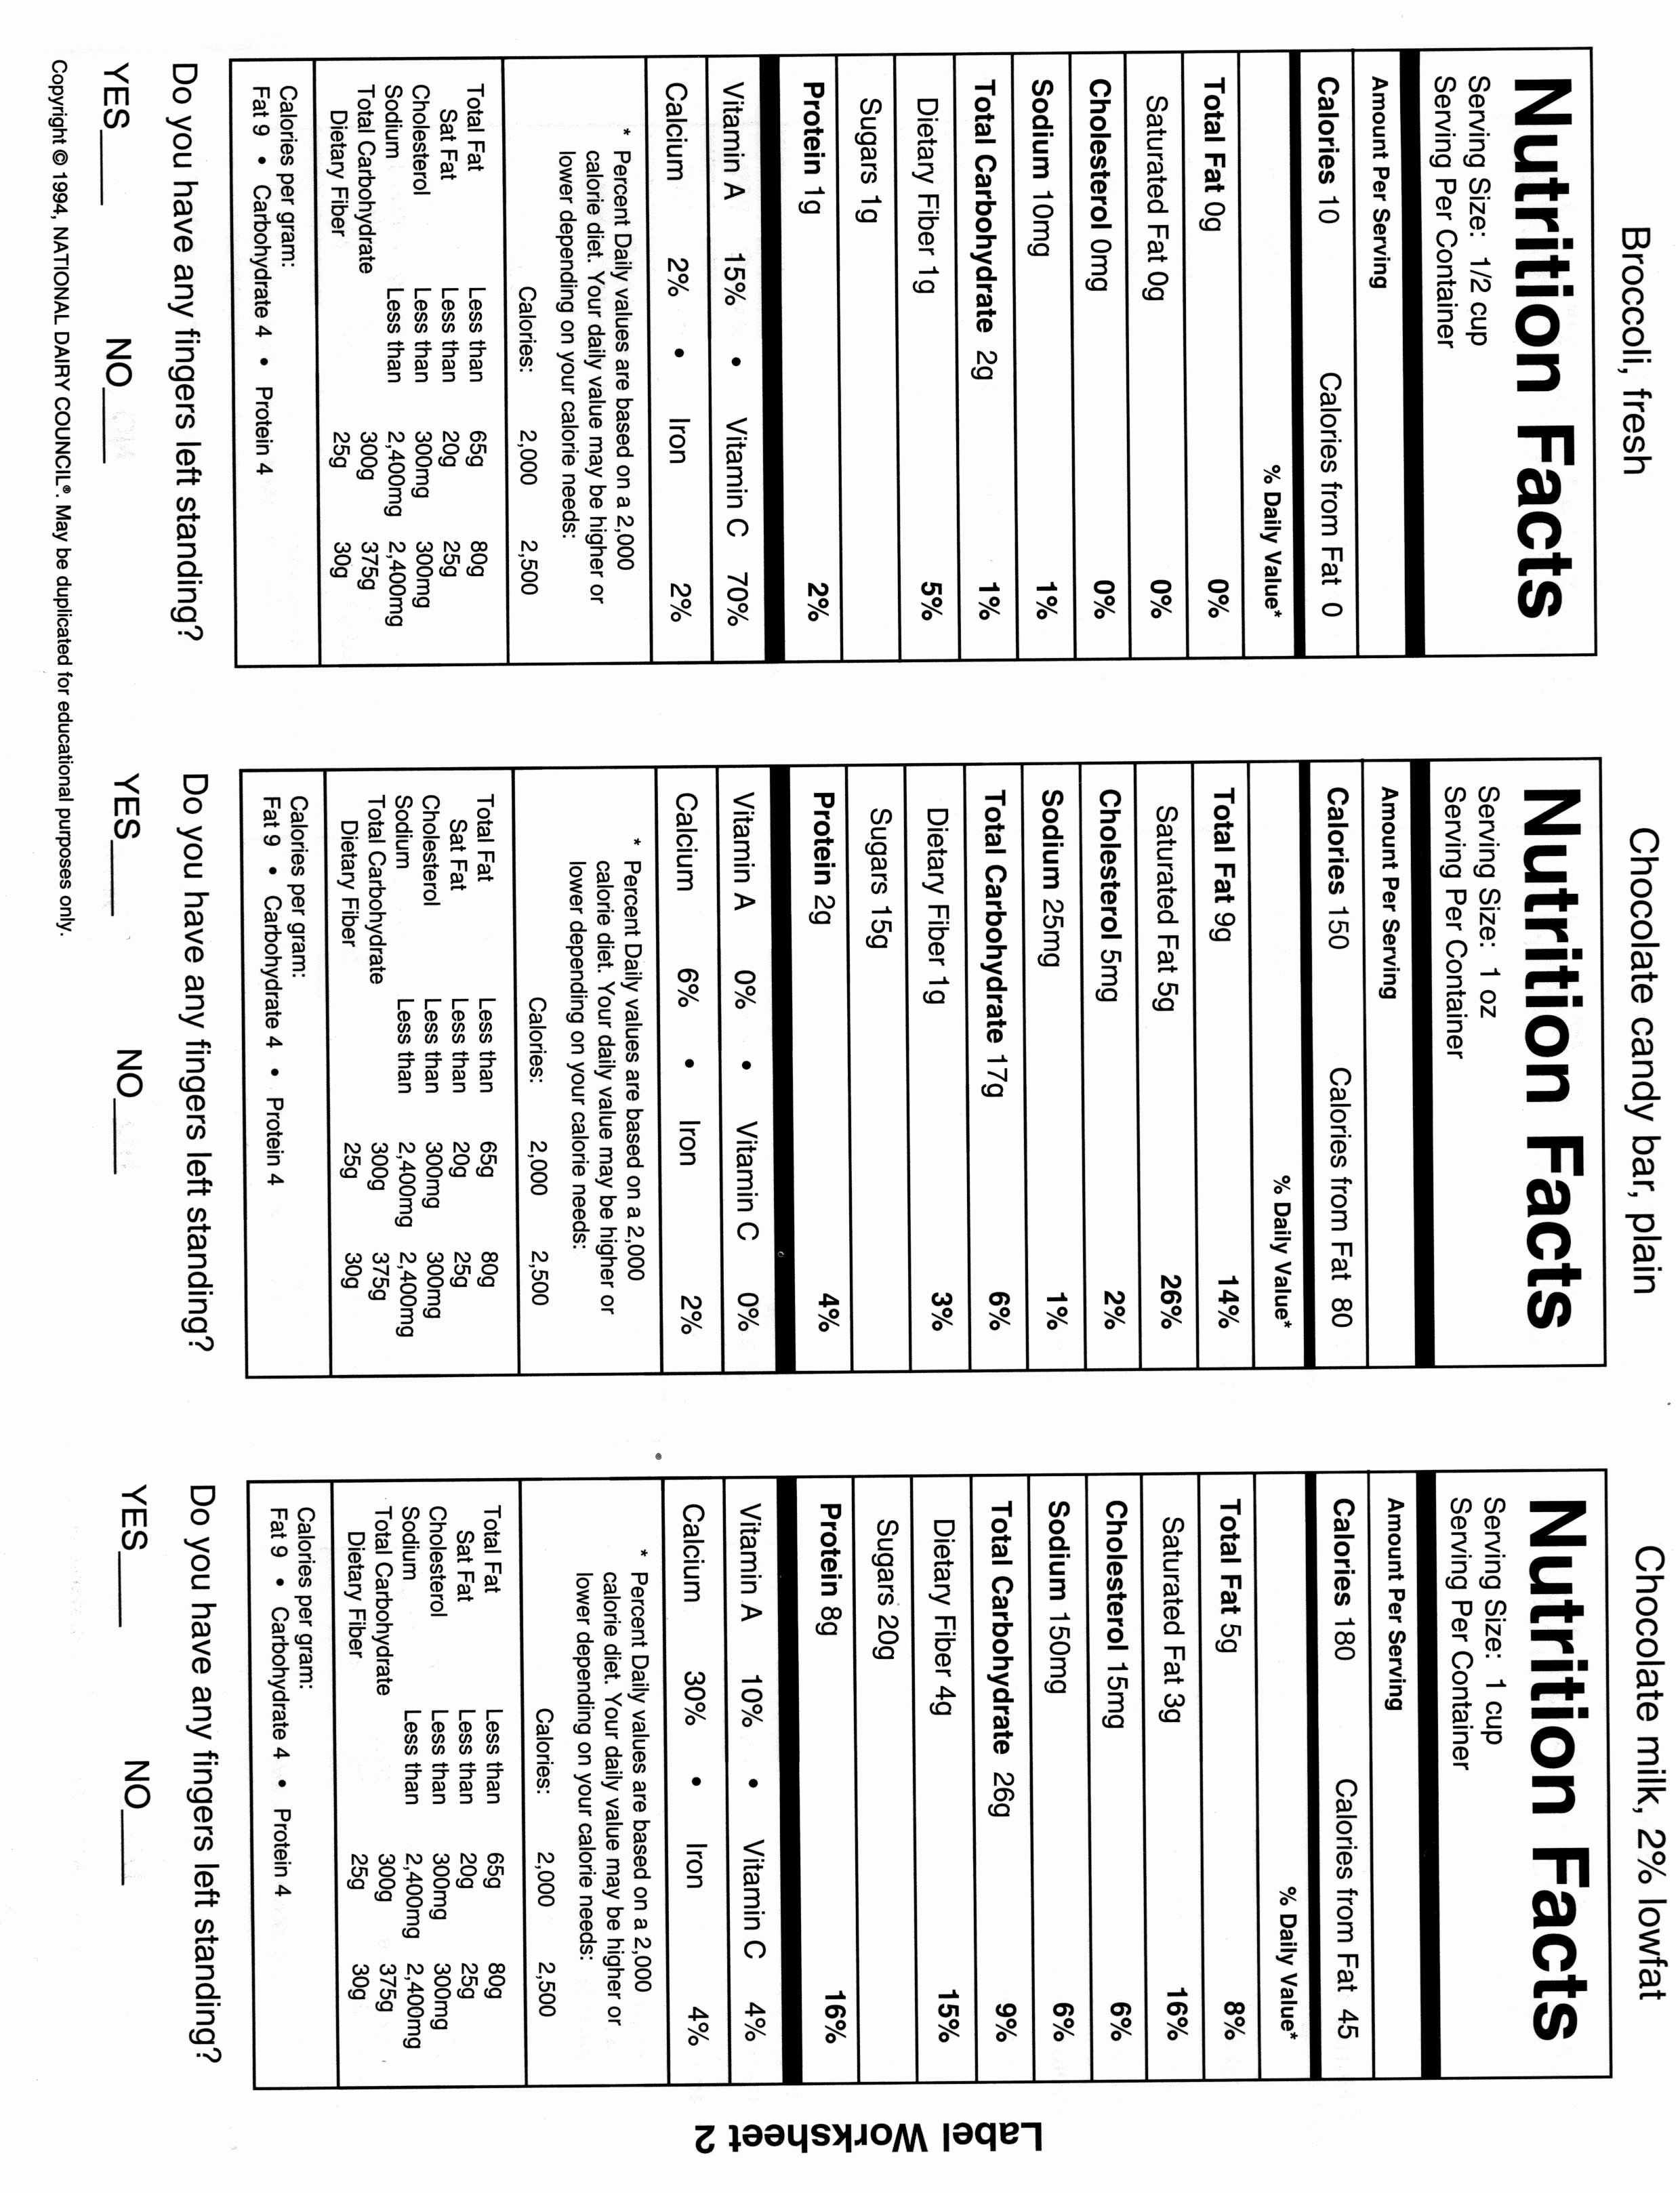 Nutrition Label Worksheet Answer Key Lovely 16 Best Of Nutrition Label Worksheet Printable